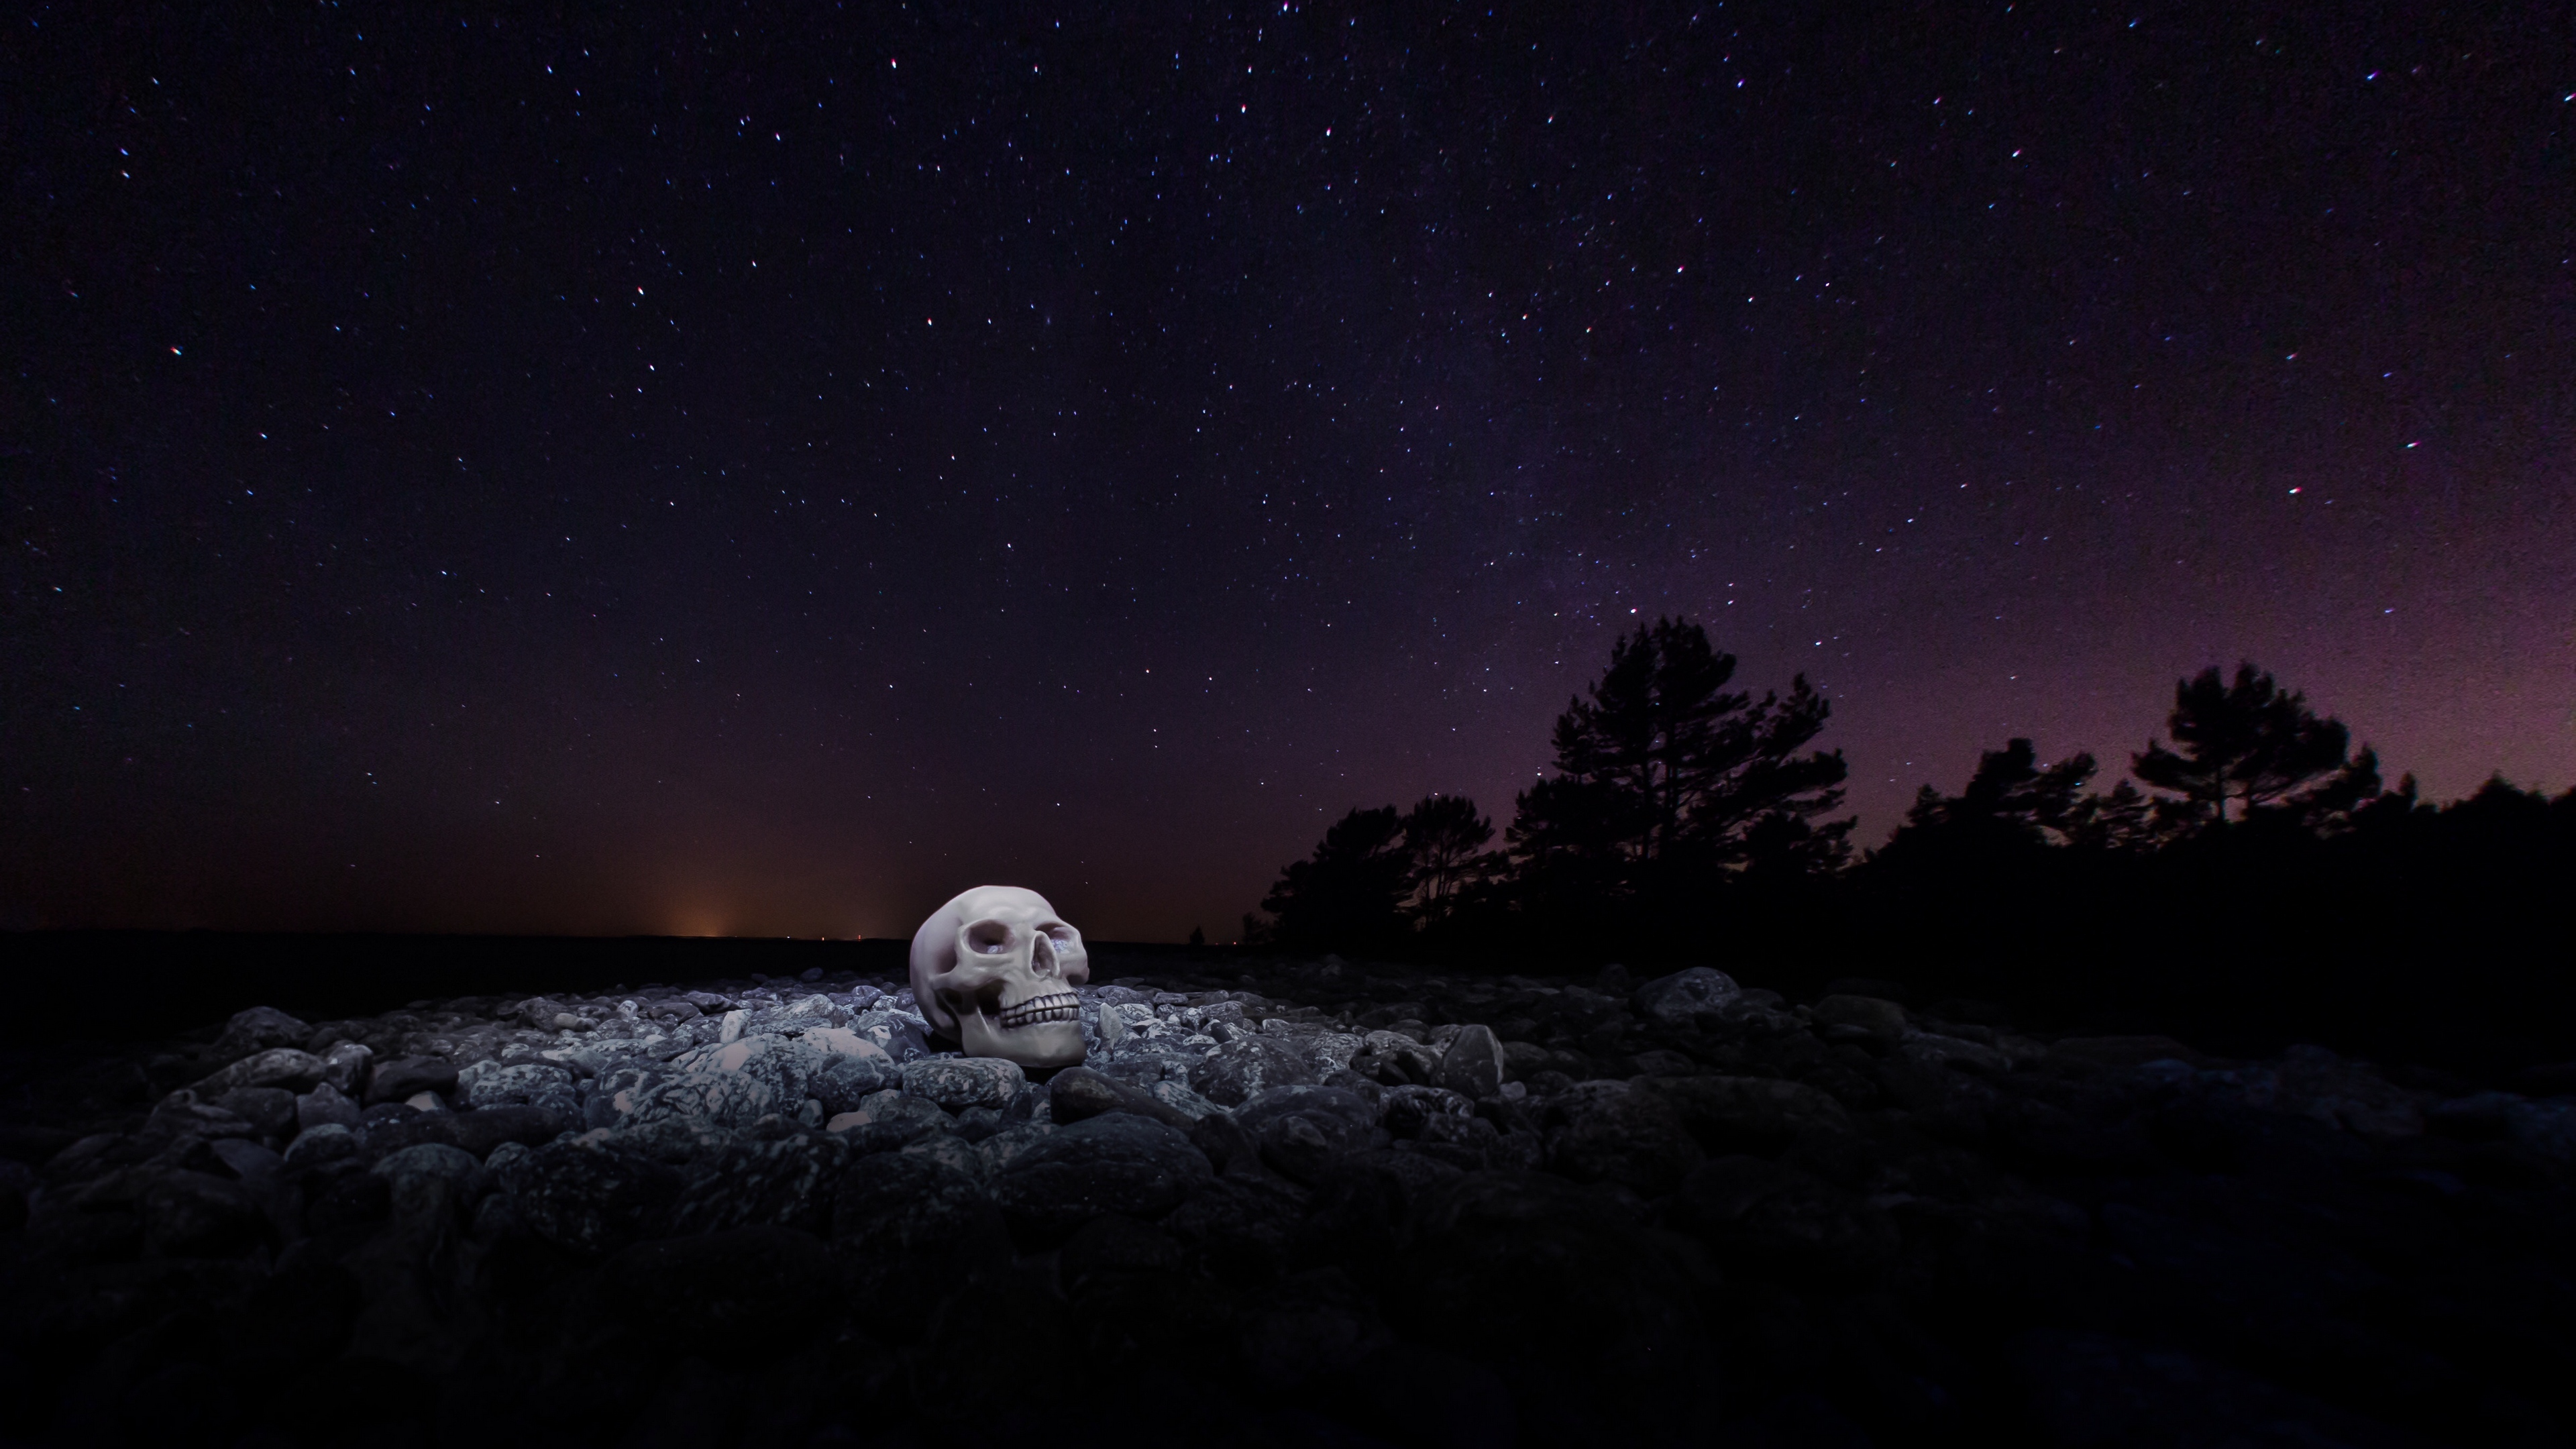 skull starry sky stones night 4k 1540574979 - skull, starry sky, stones, night 4k - Stones, starry sky, Skull